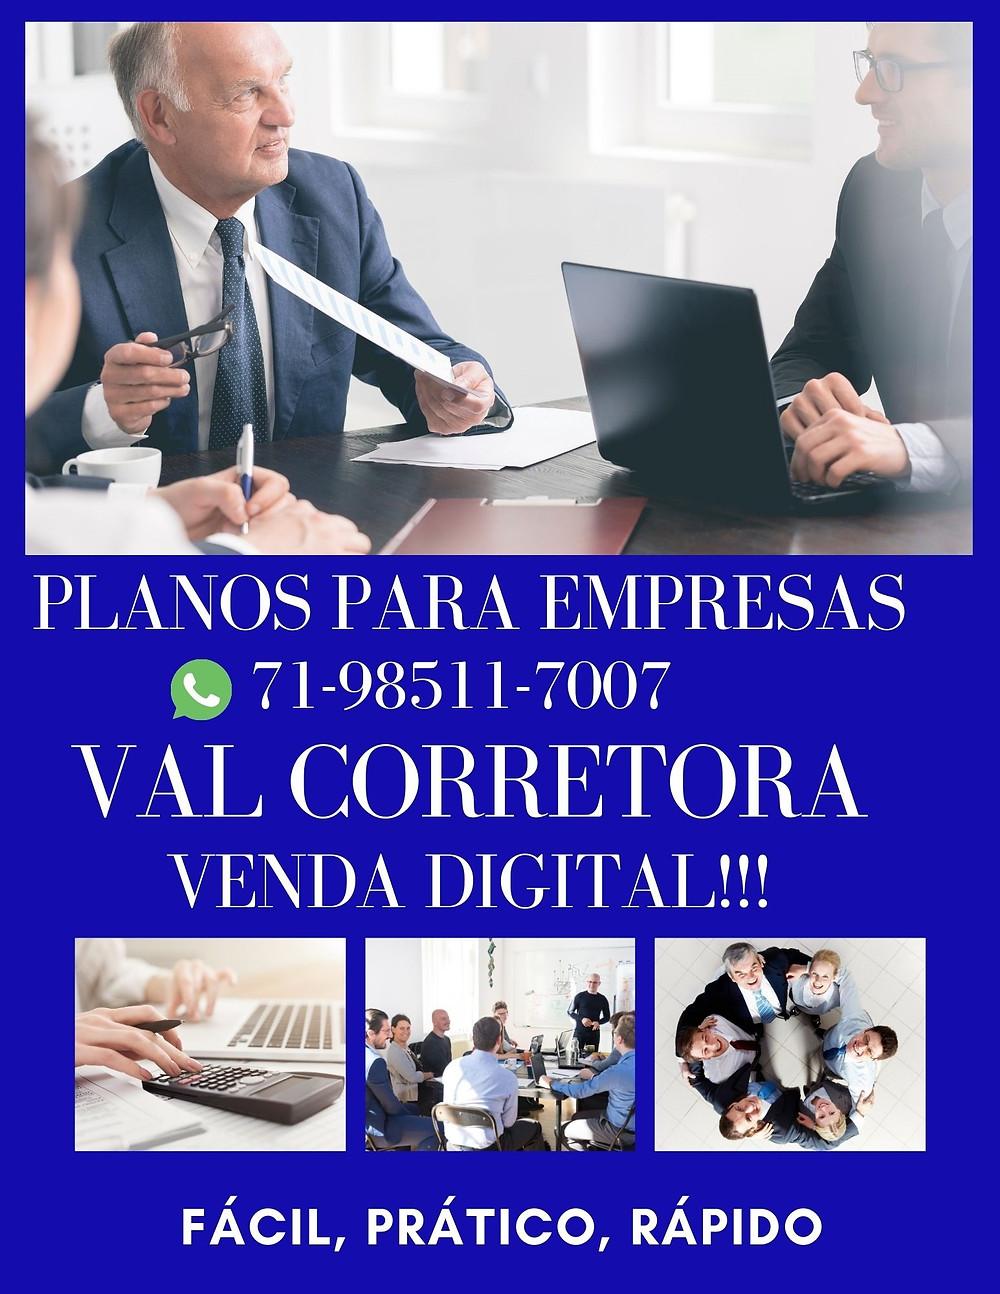 Empresarial | Planos de Saúde